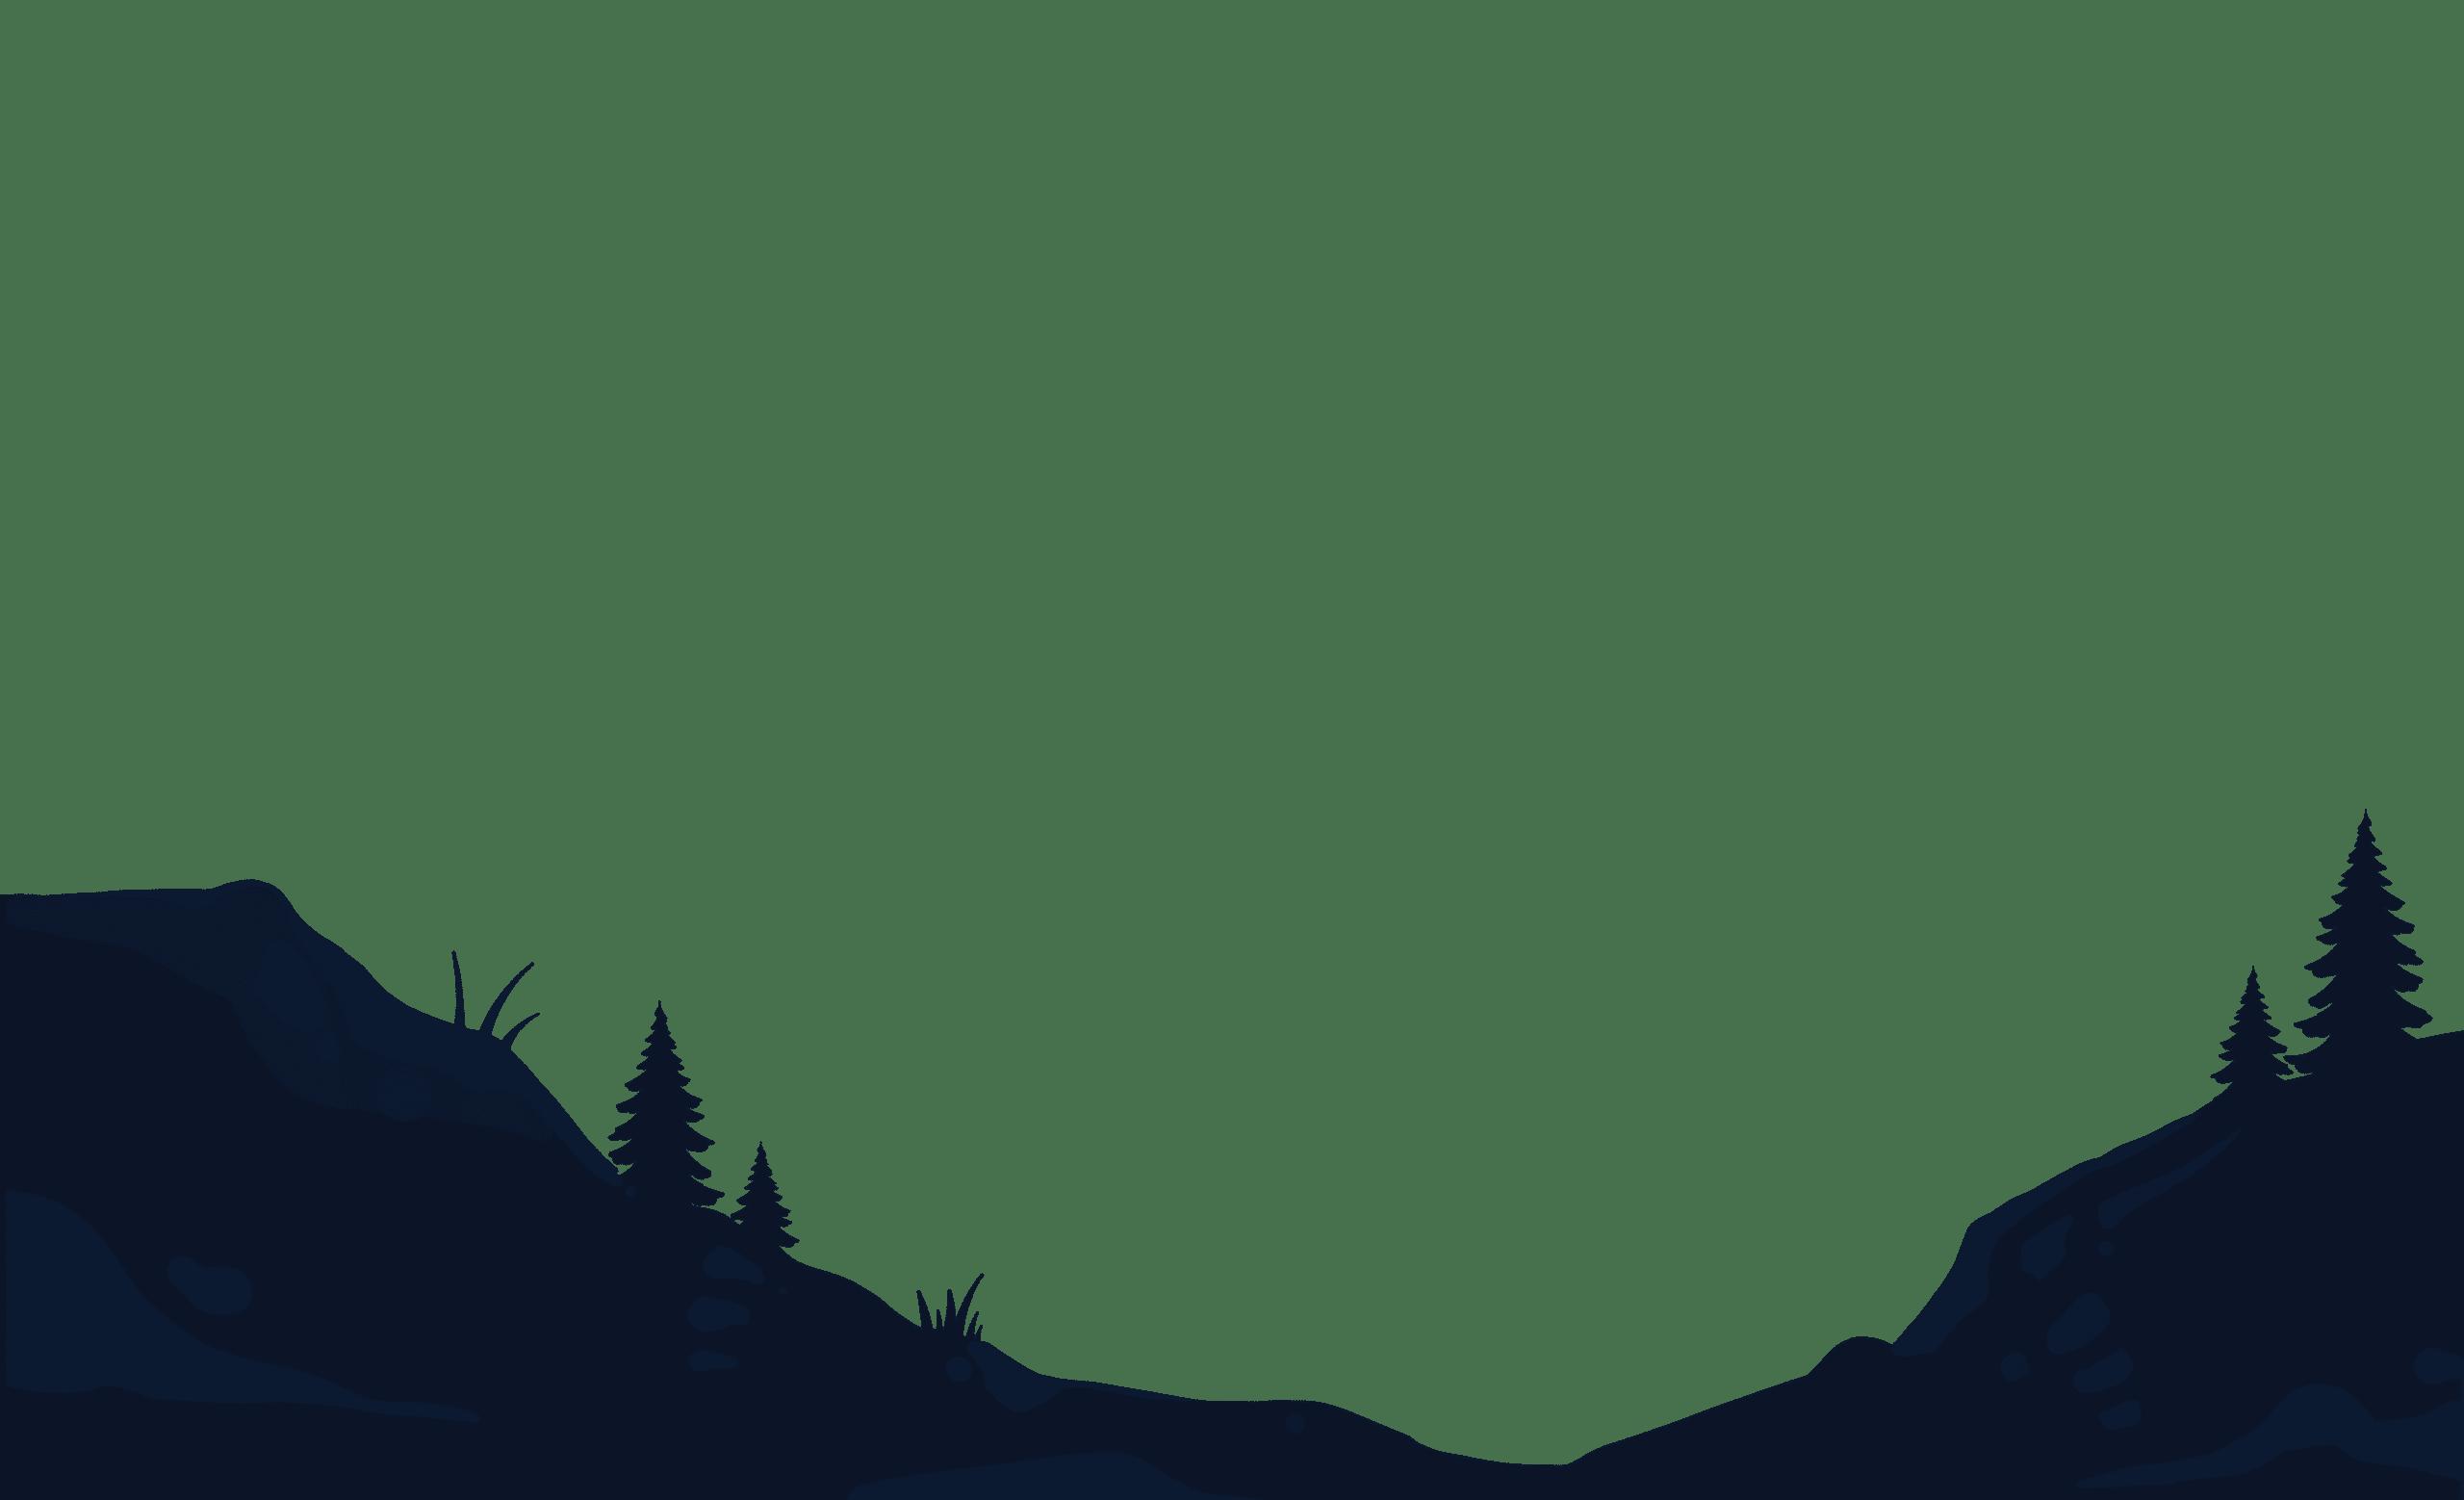 White Peak Digital Foreground